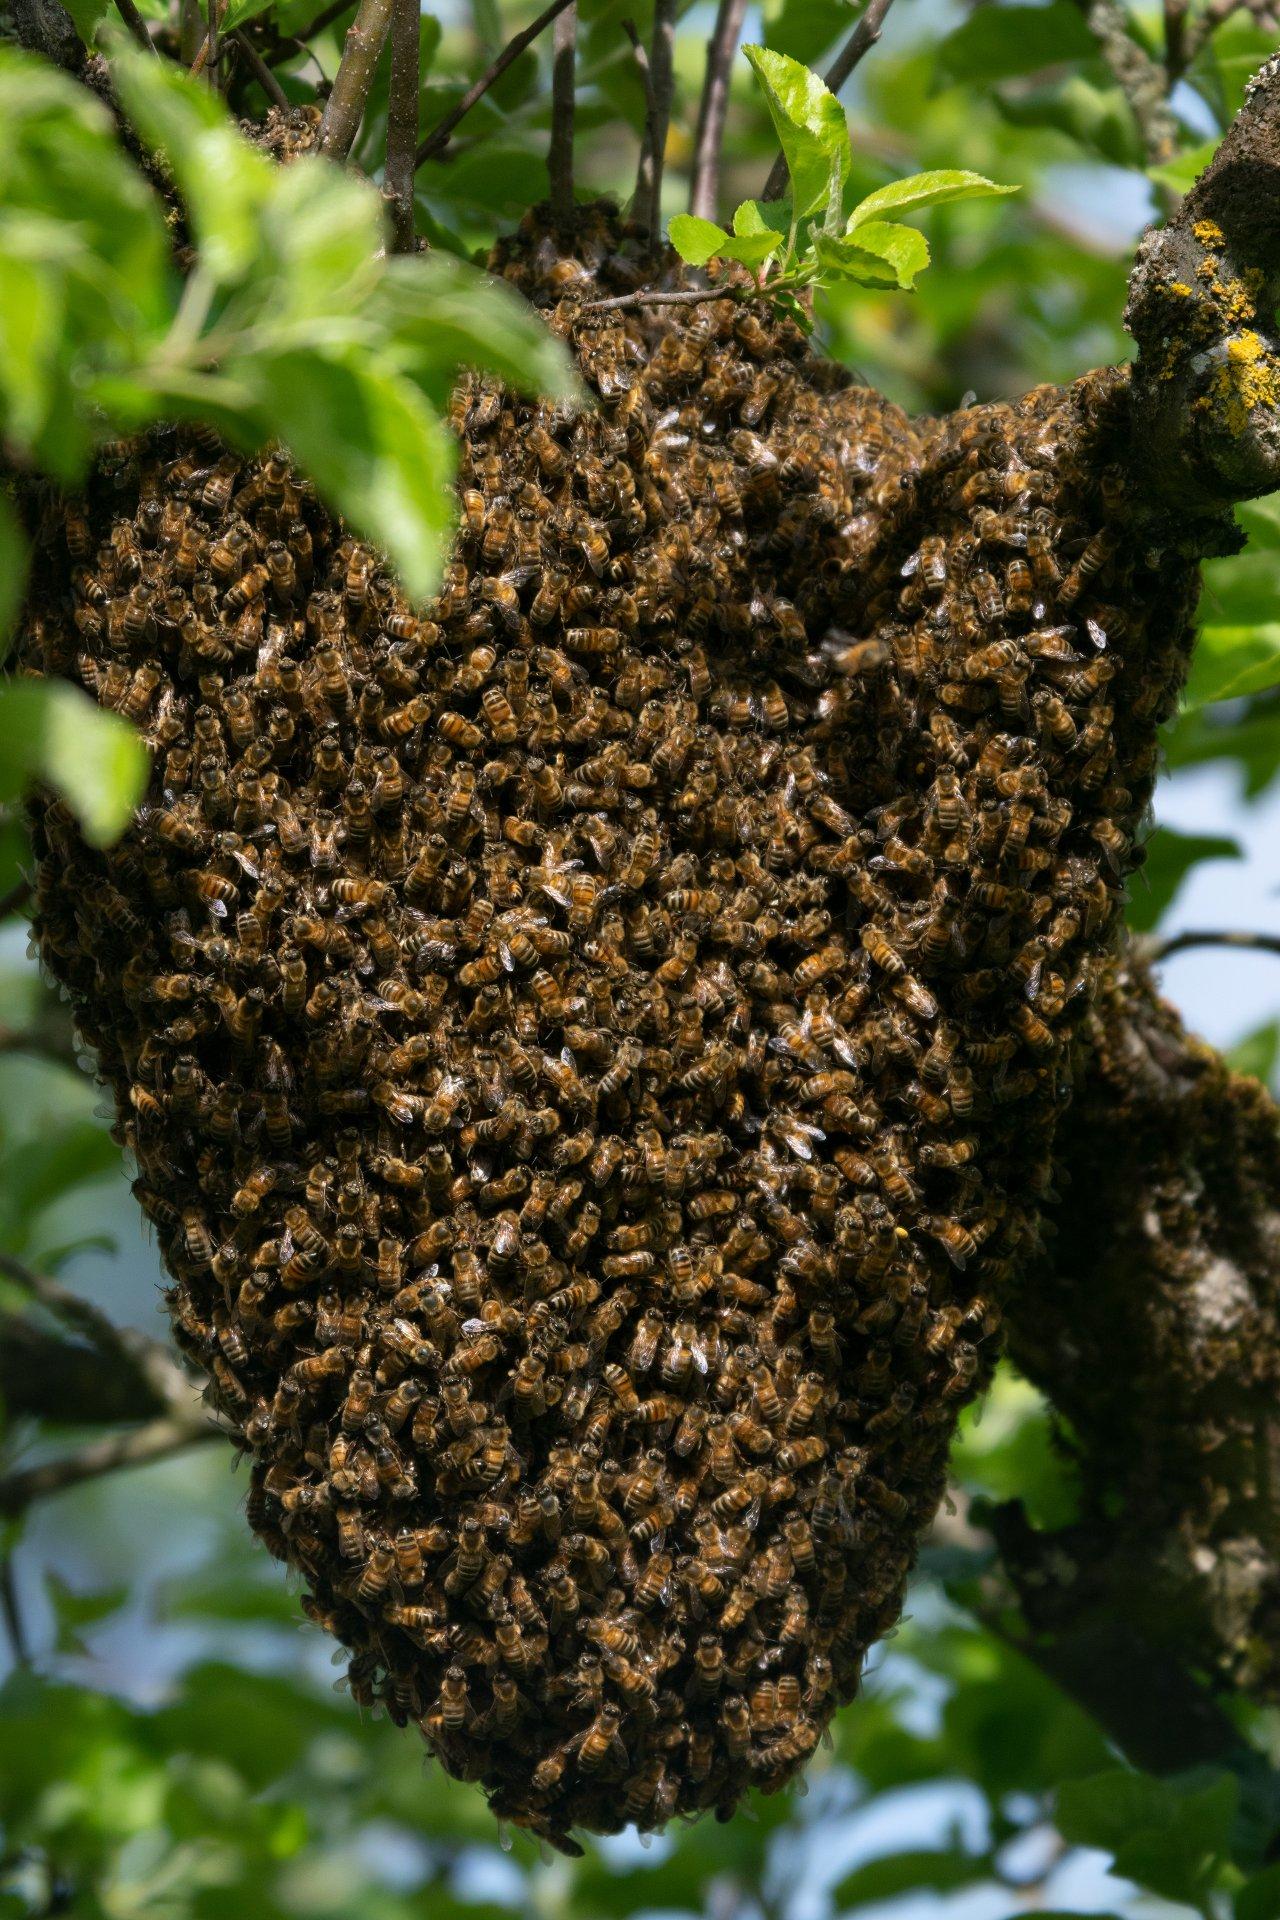 Bienenschwarm.jpg